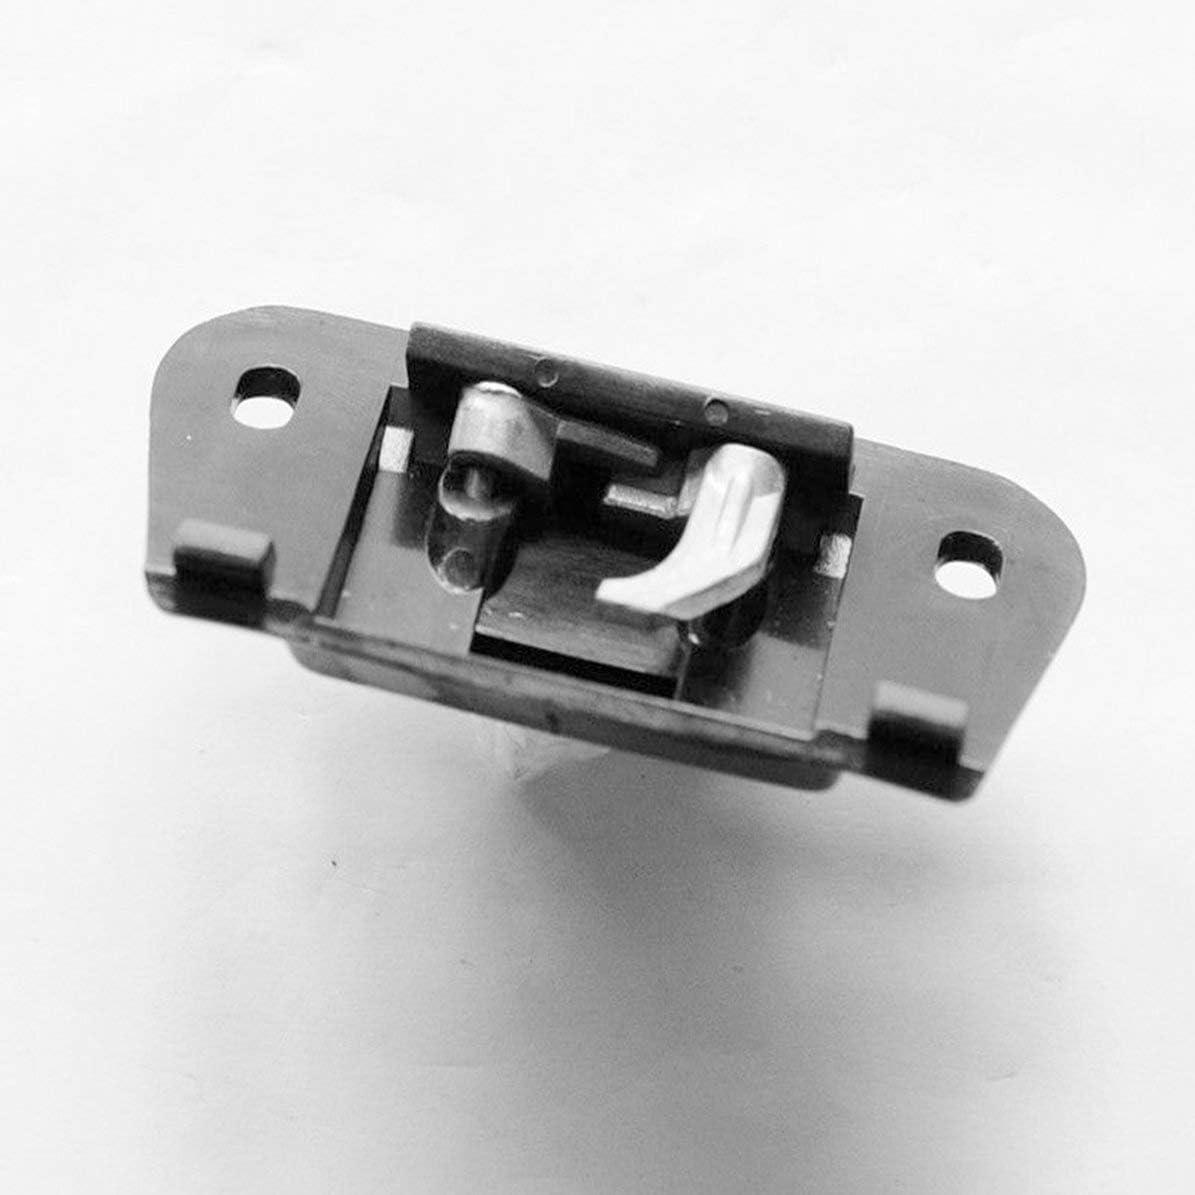 D2/= 16 Komp: Aluminium Bascule main Roue avec /écrou en aluminium 1/pi/èce D1/= 180 k0160.3180/x 16